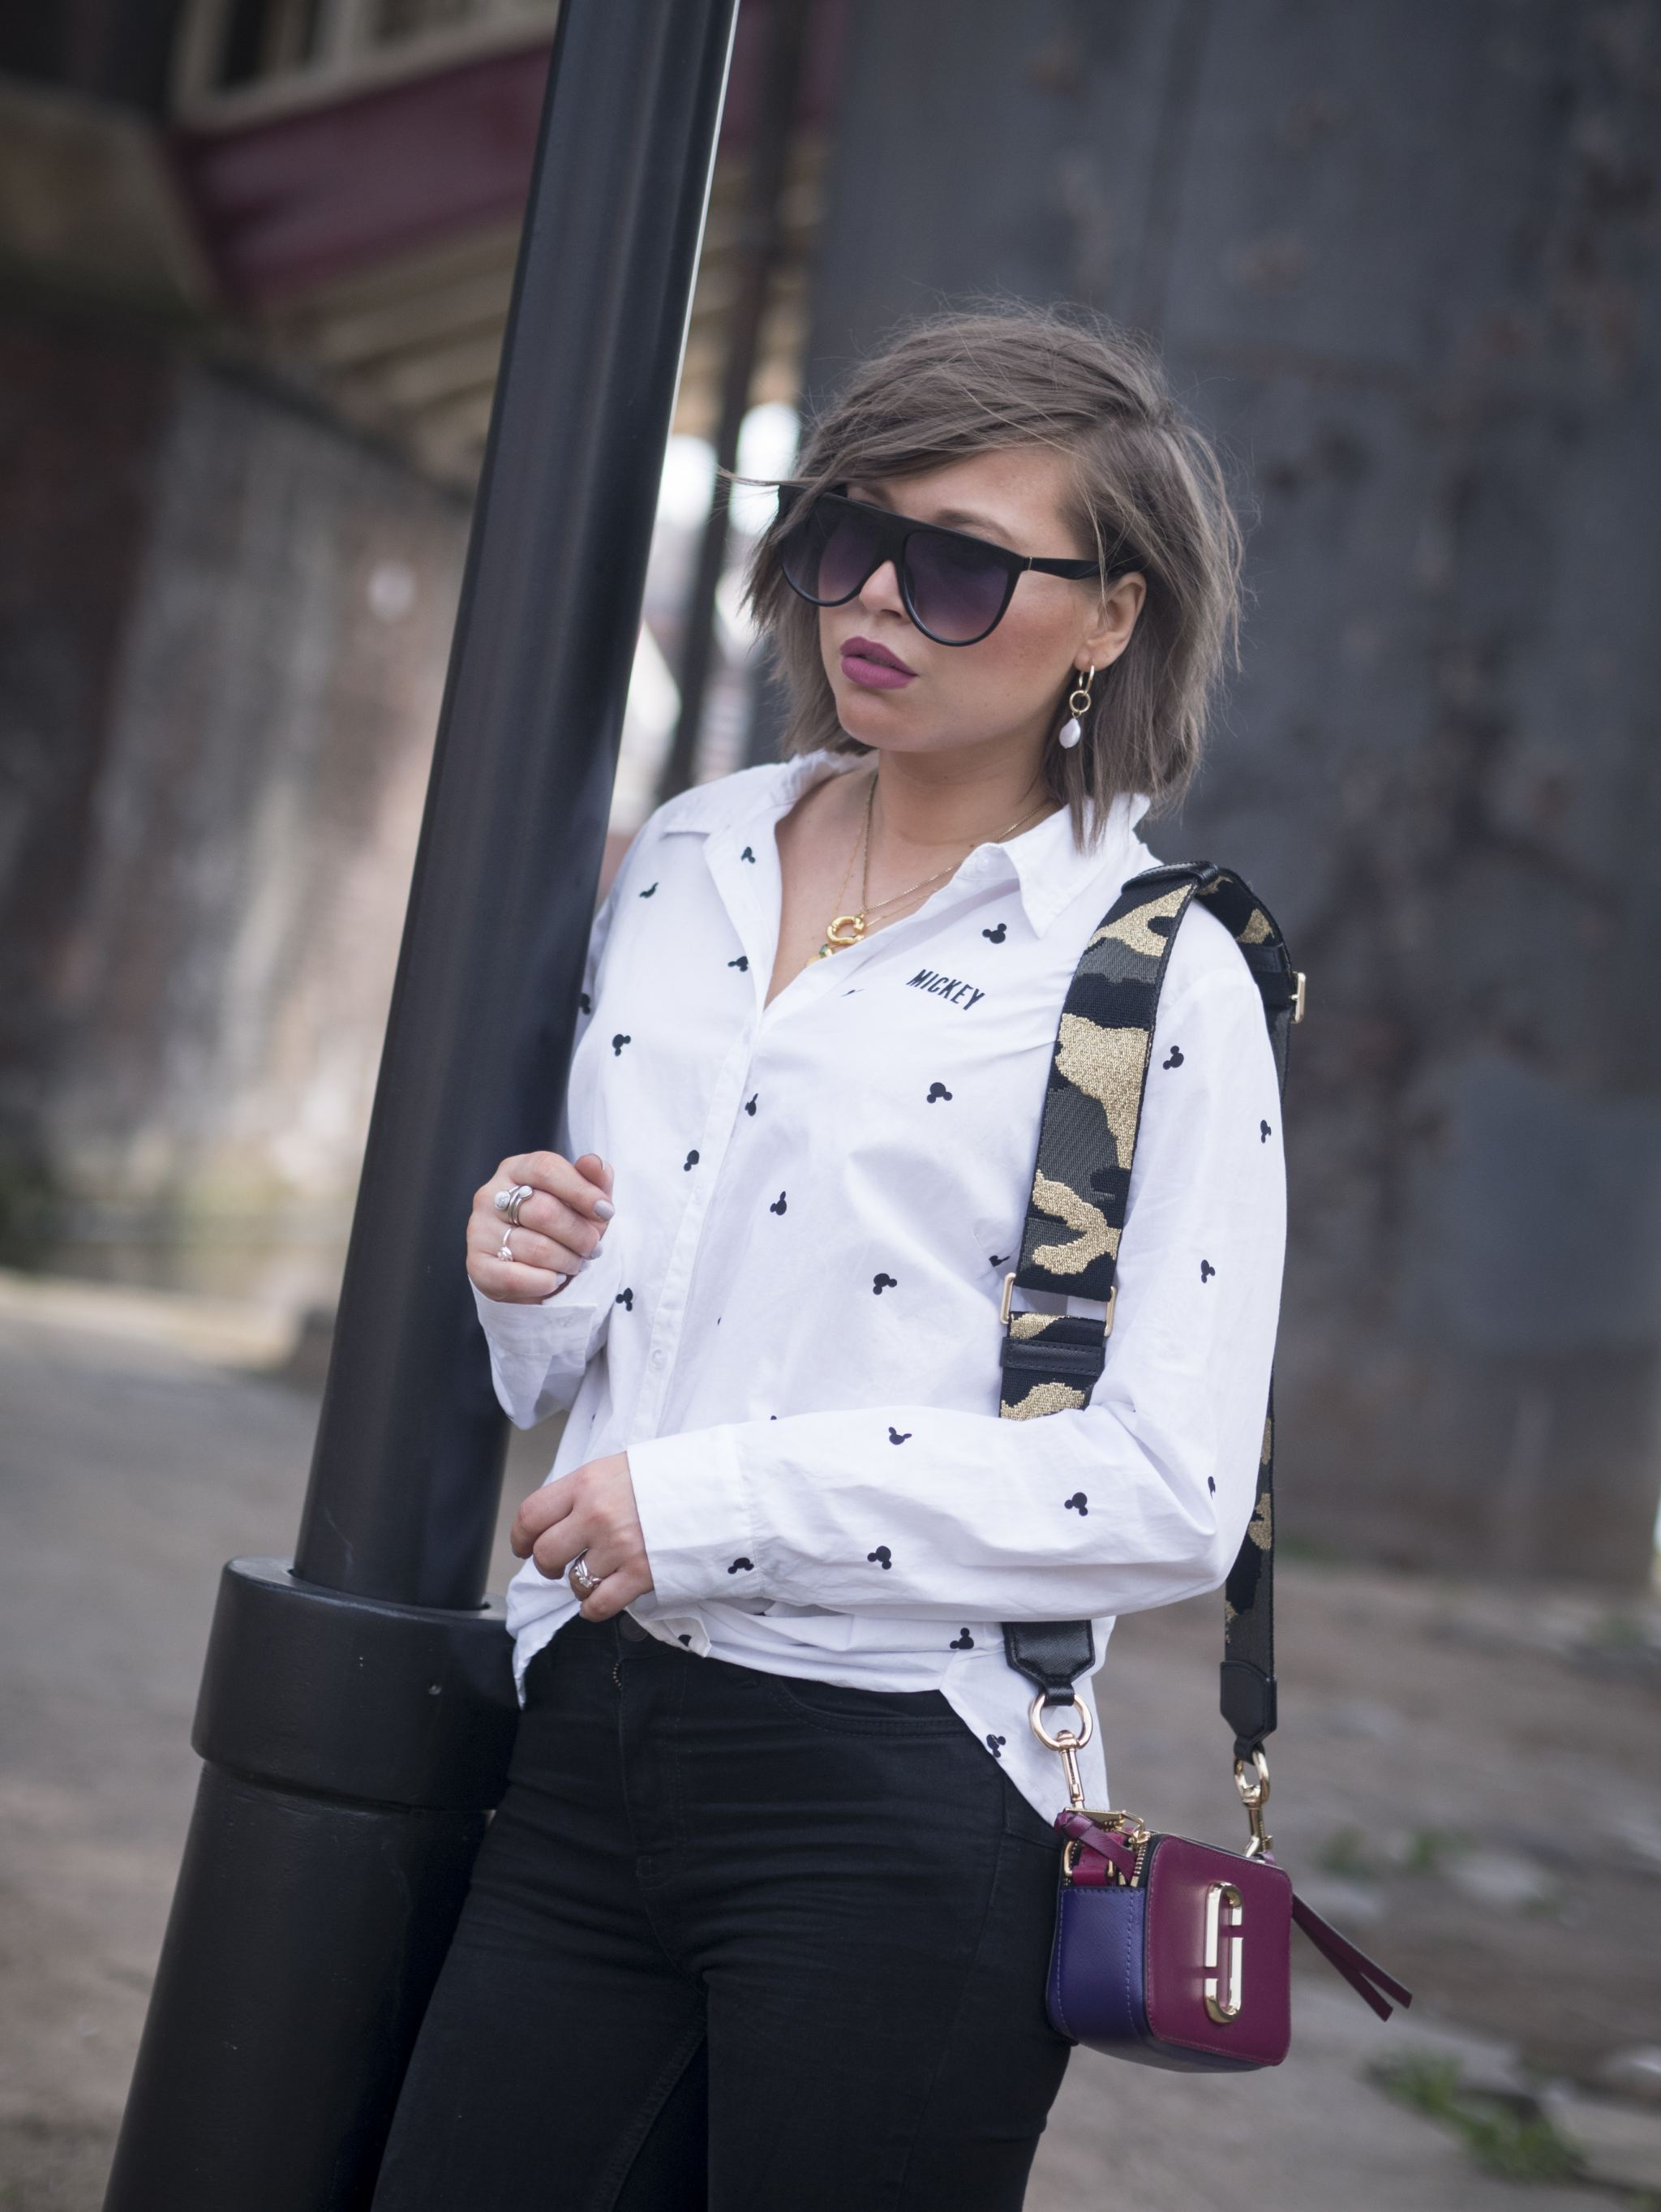 manchester fashion blogger, manchester bloggers, fall tends, ukblogger, manchester , blogger , lifestyle blogger